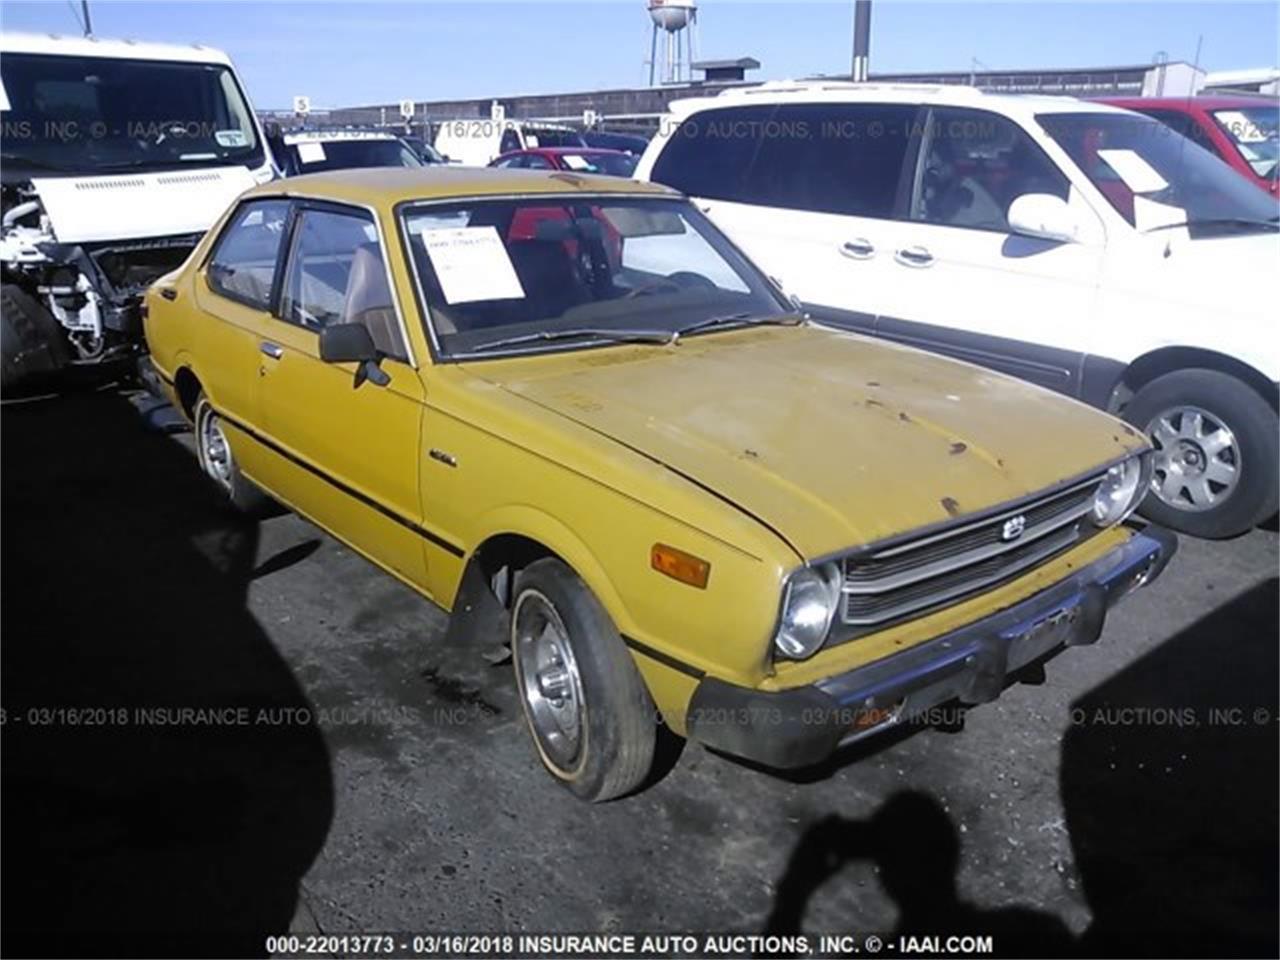 Toyota Dealers In Az >> 1977 Toyota Corolla for Sale   ClassicCars.com   CC-1076456